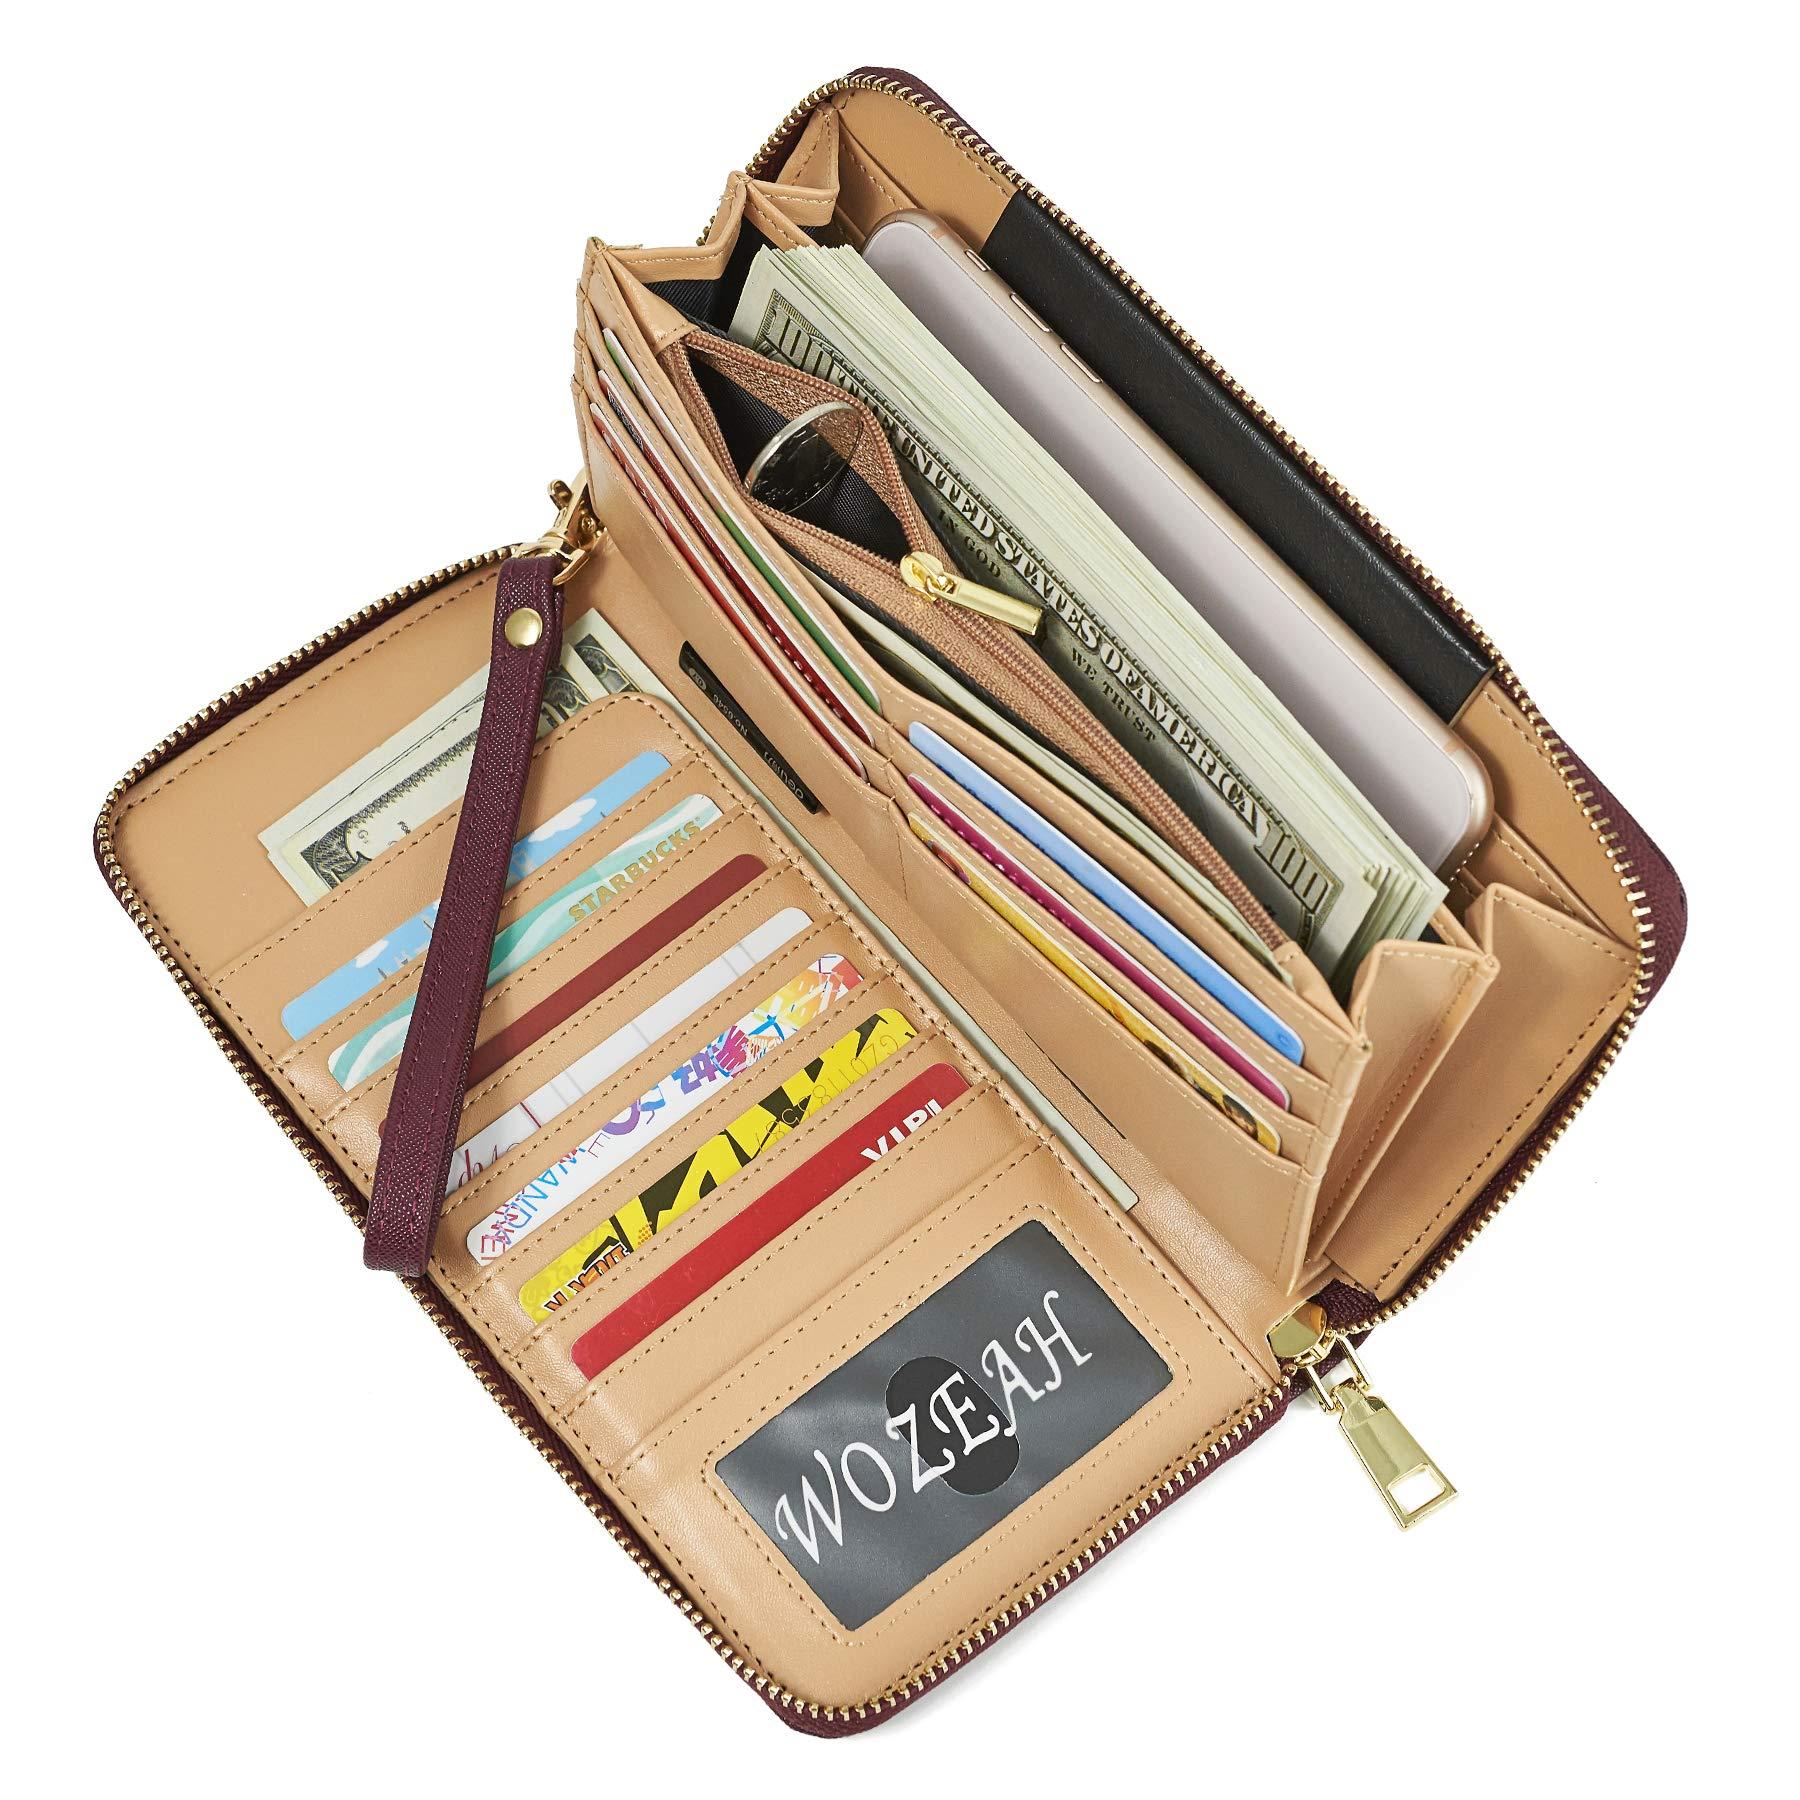 WOZEAH Women's RFID Blocking PU Leather Zip Around Wallet Clutch Large Travel Purse (wine red)